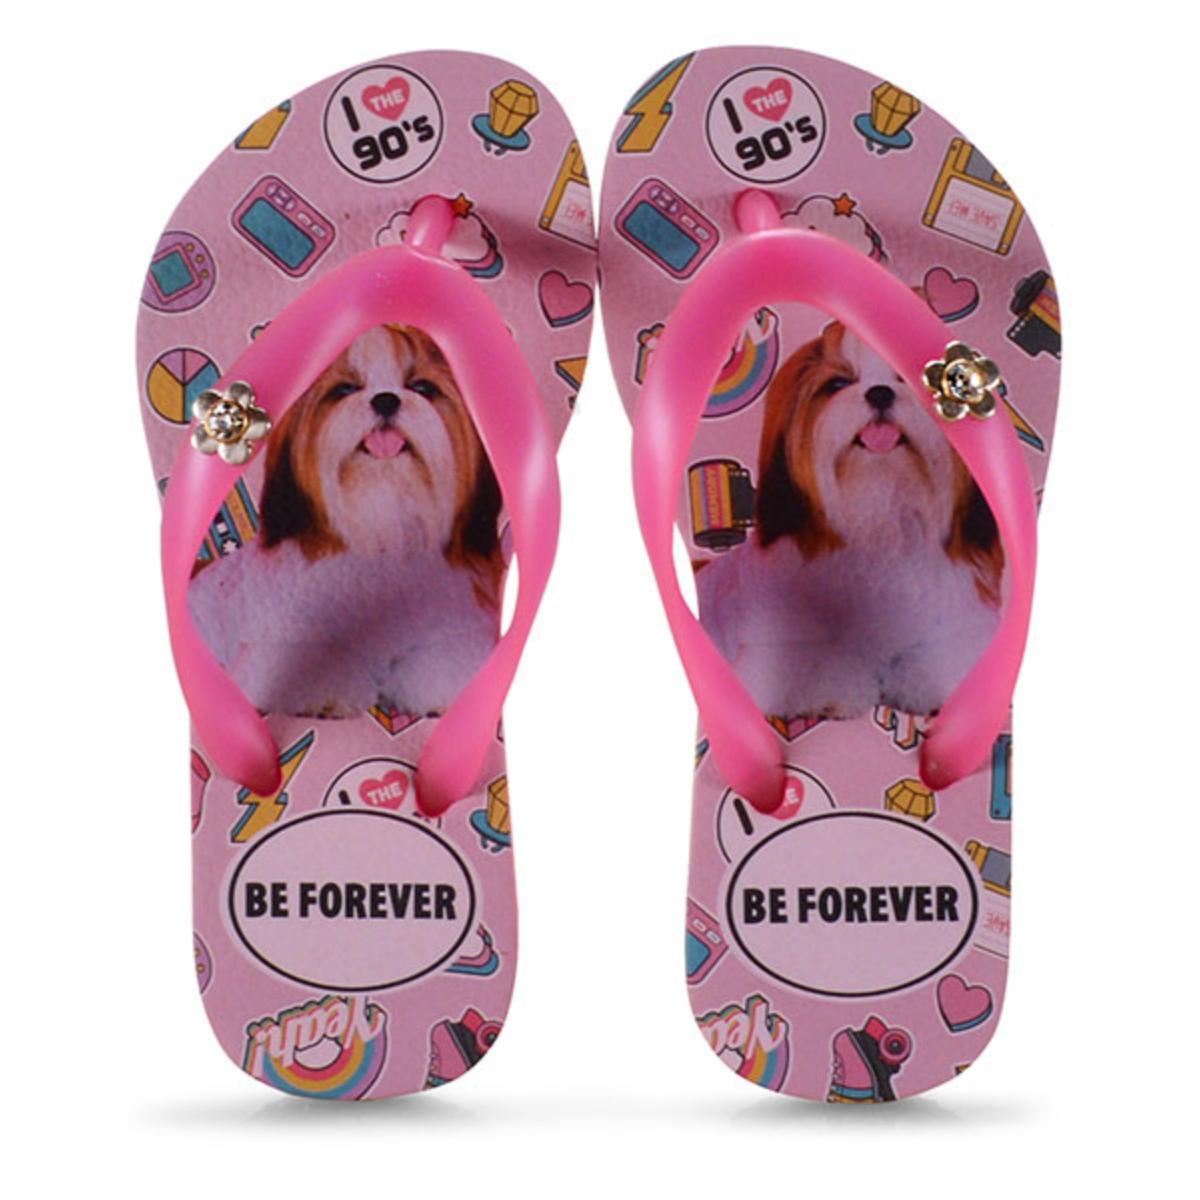 Chinelo Fem Infantil Rafitthy 118.01701 Shitzu 90s Pink